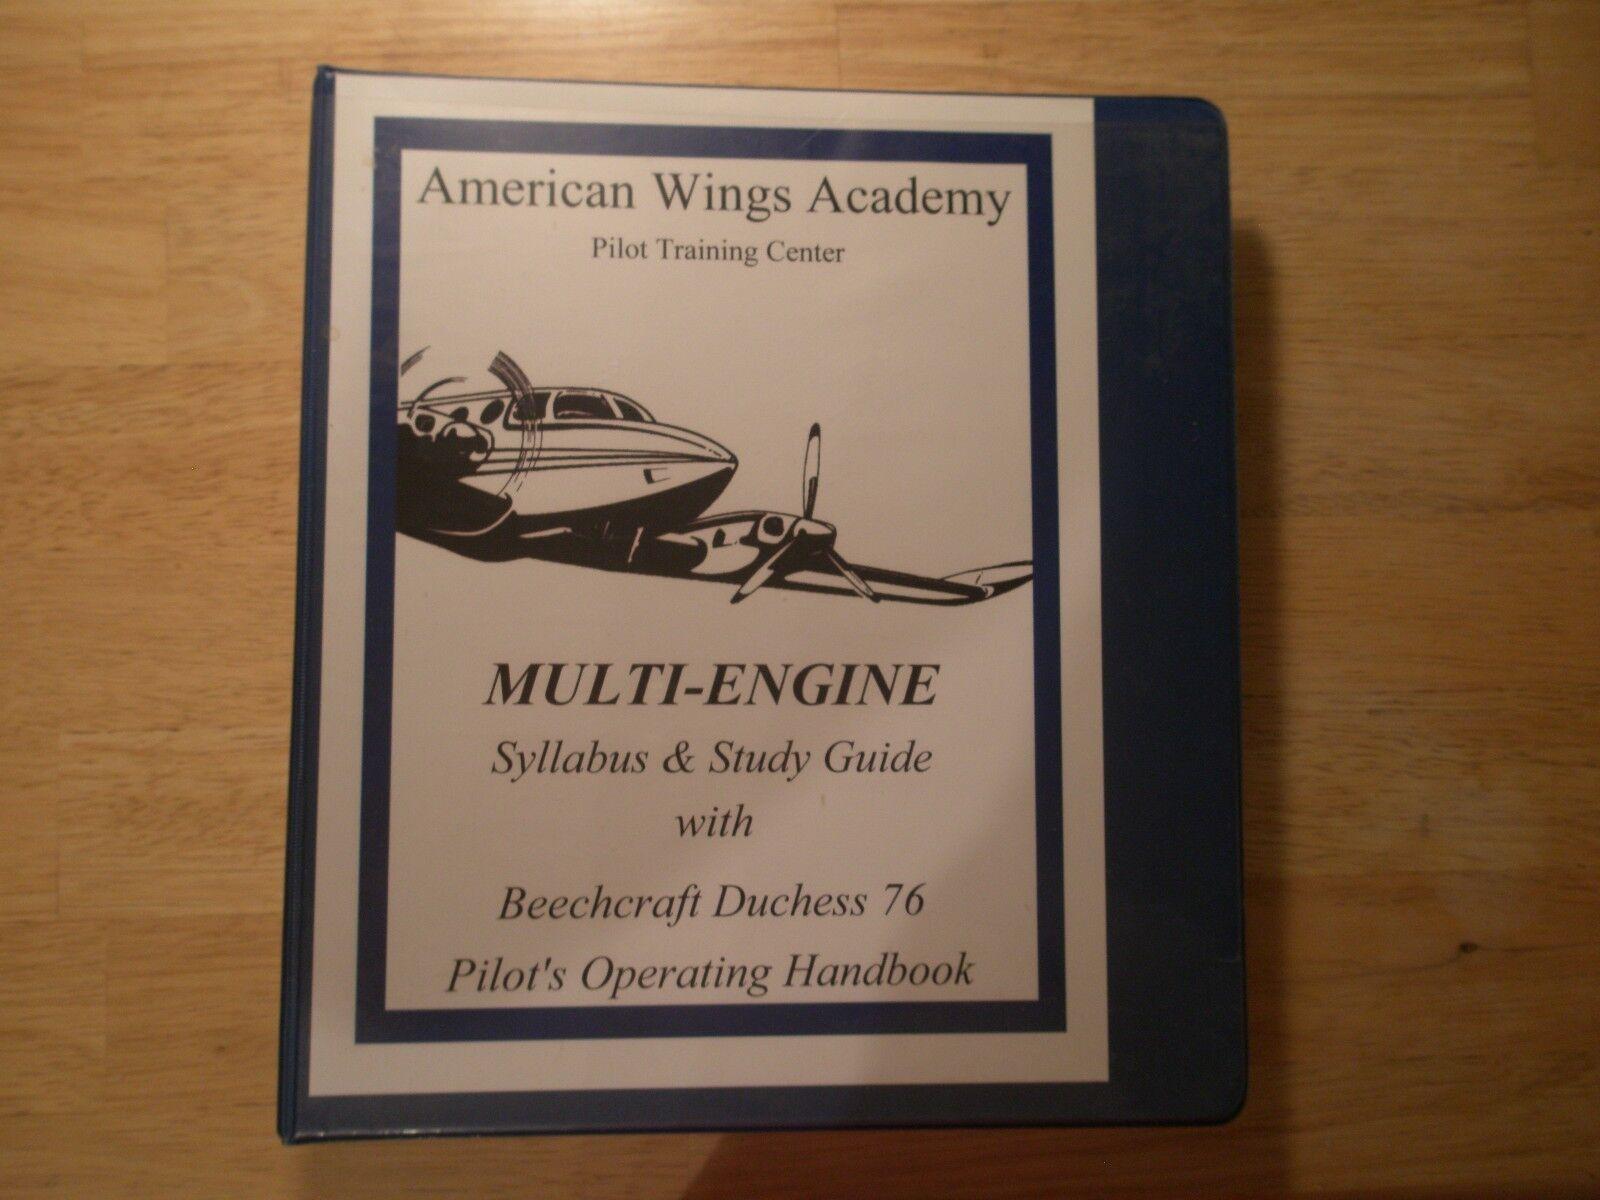 Beechcraft Duchess 76 Pilot's Operating Handbook Flight Manual